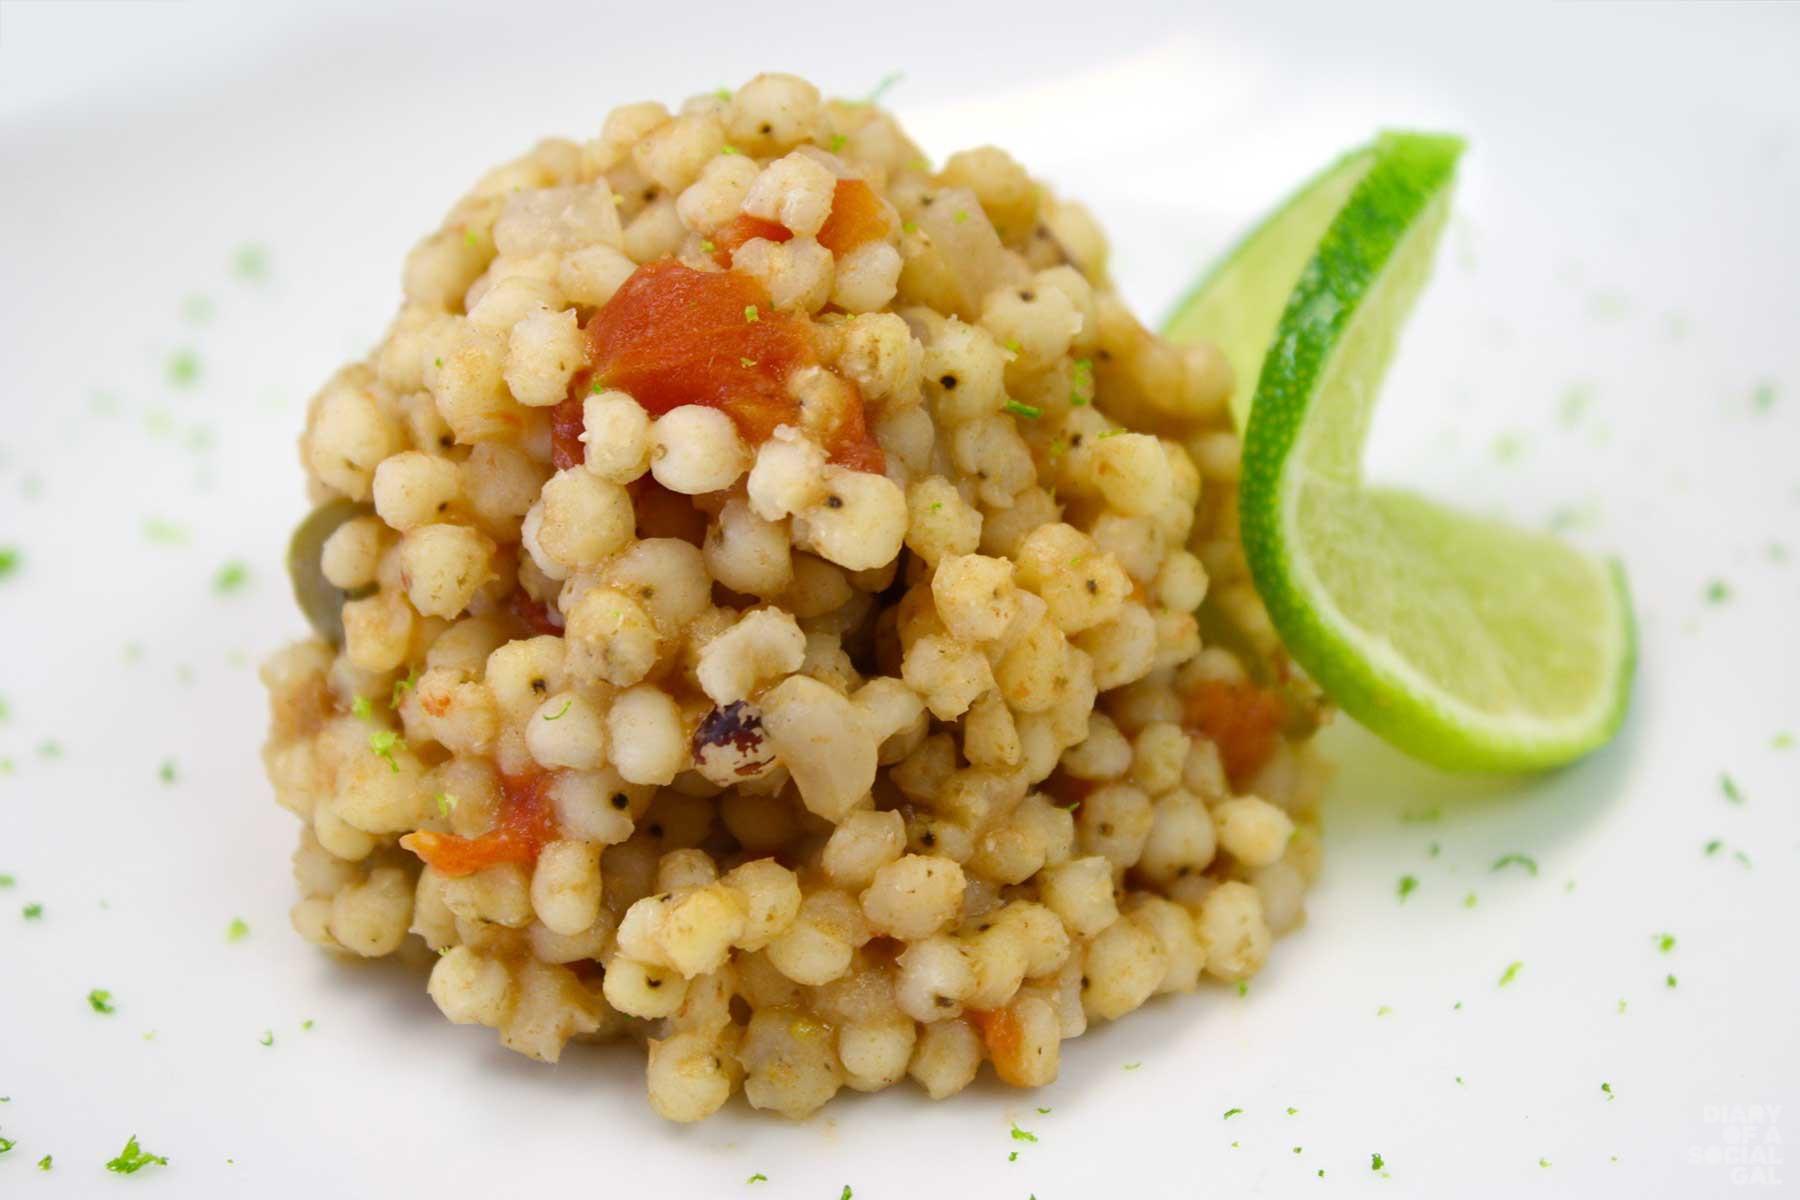 Spanish-Style-White-Pearled-Sorghum-Grain